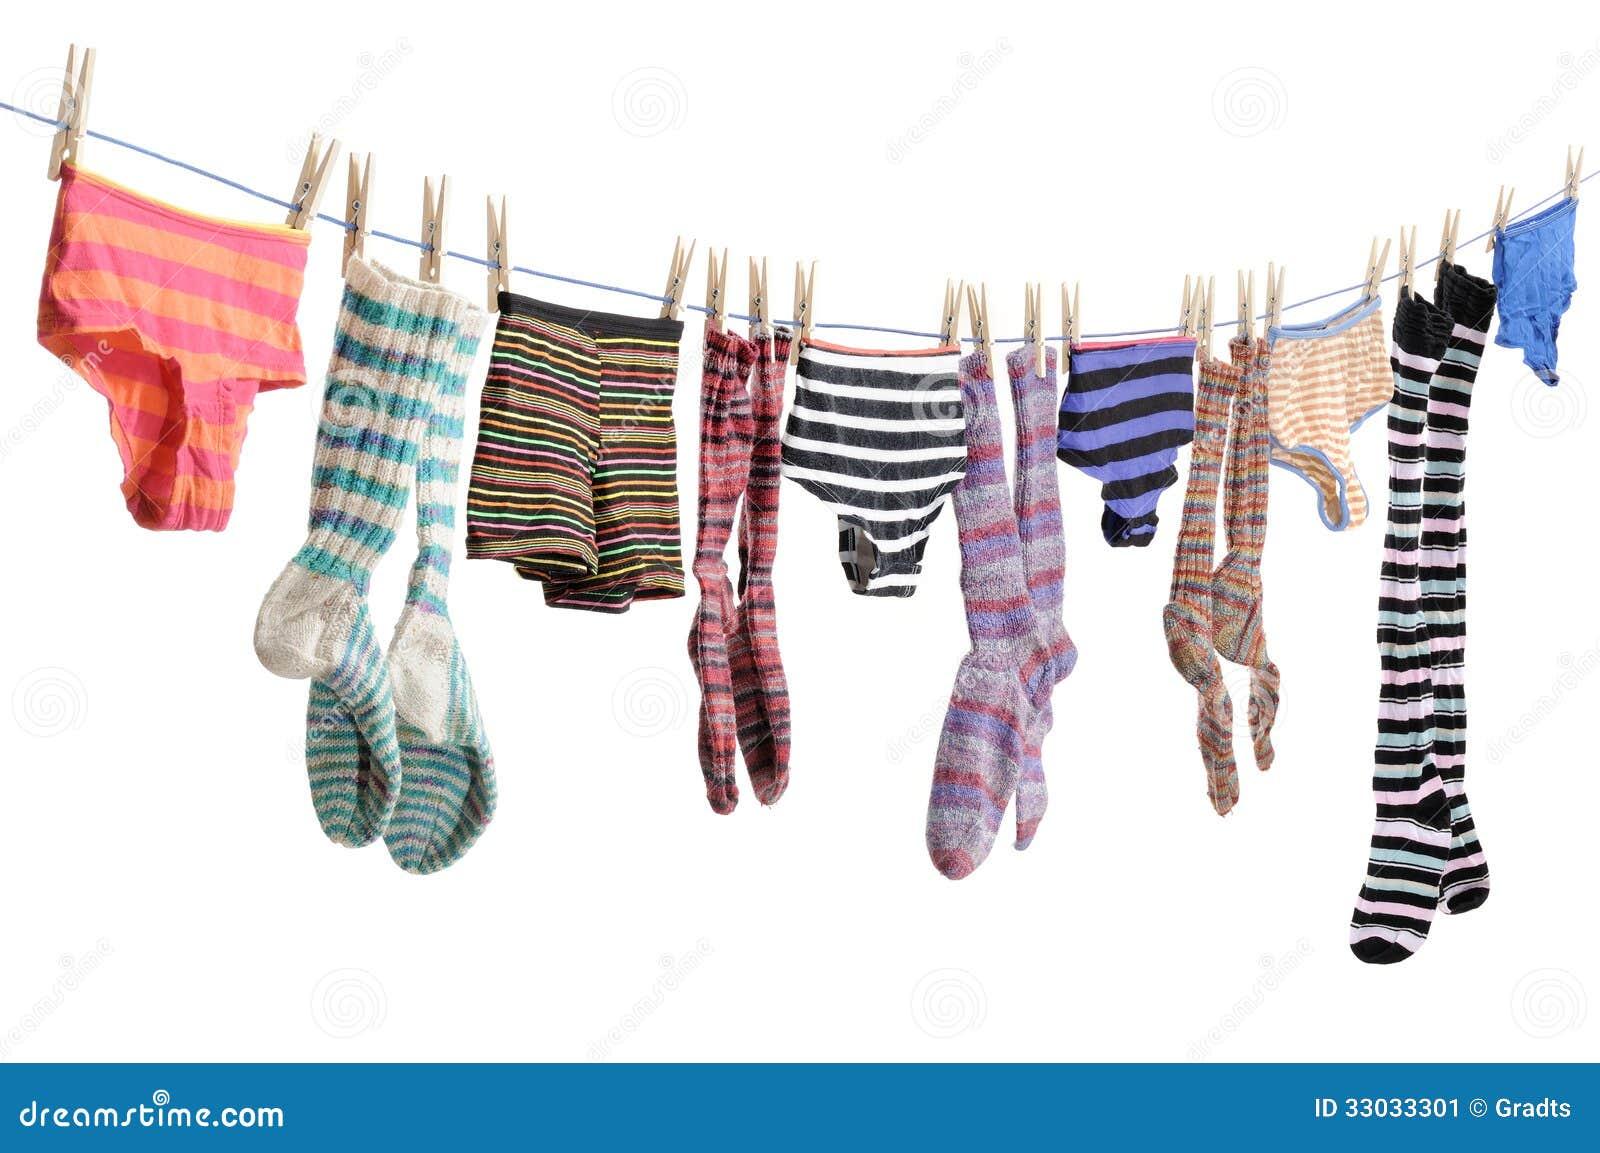 Clothesline Stock Image - Image: 33033301